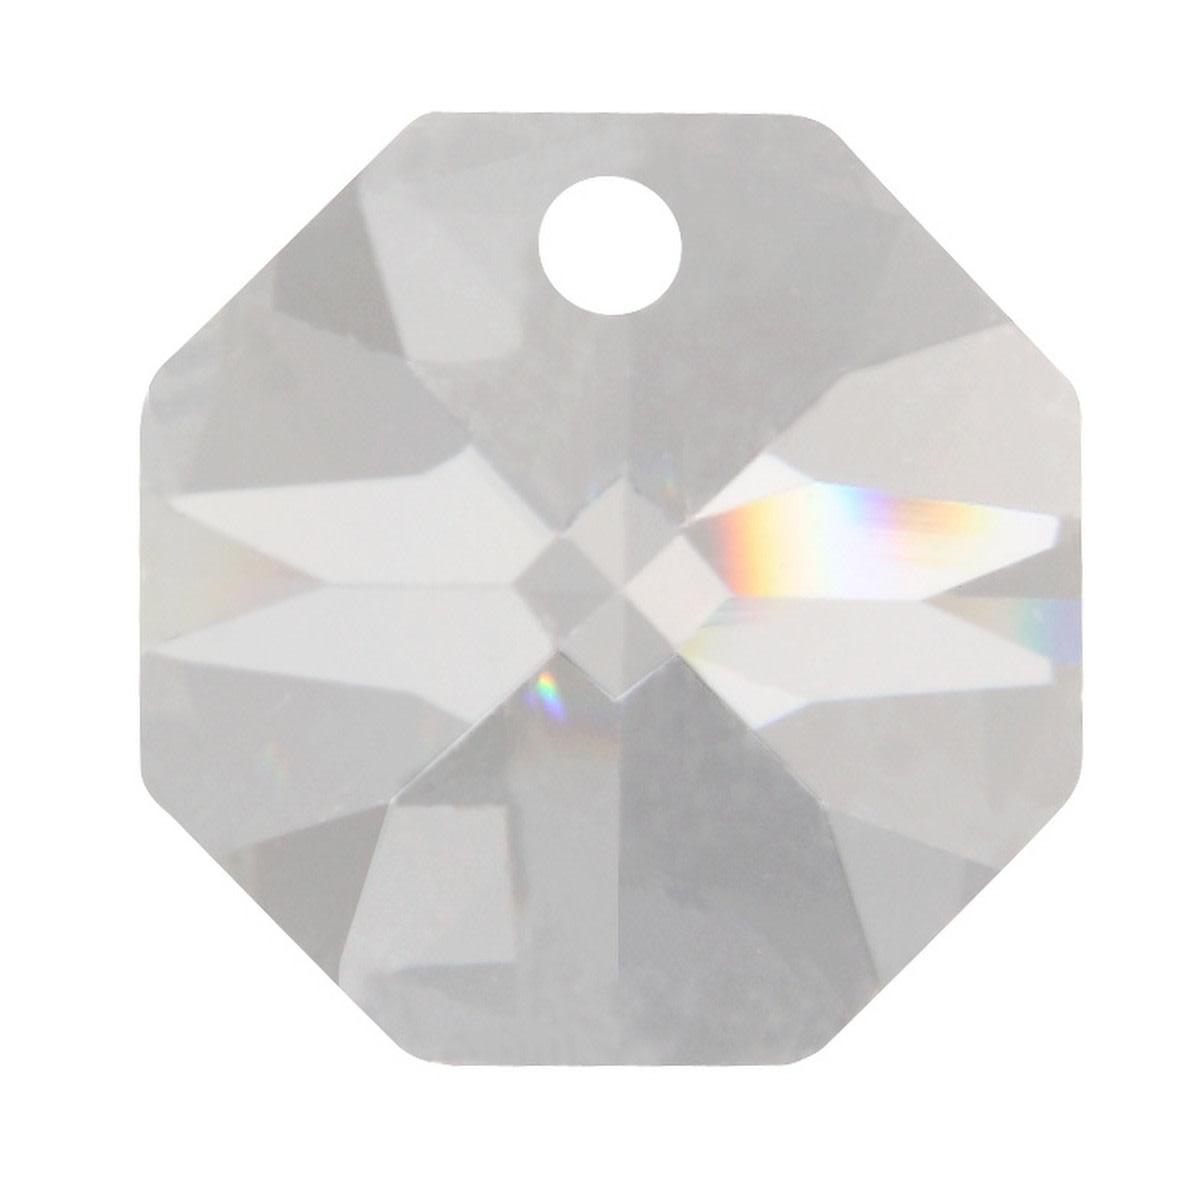 "Allegri 028722 Silver Prive 4-Light 17""W Bathroom Vanity ..."